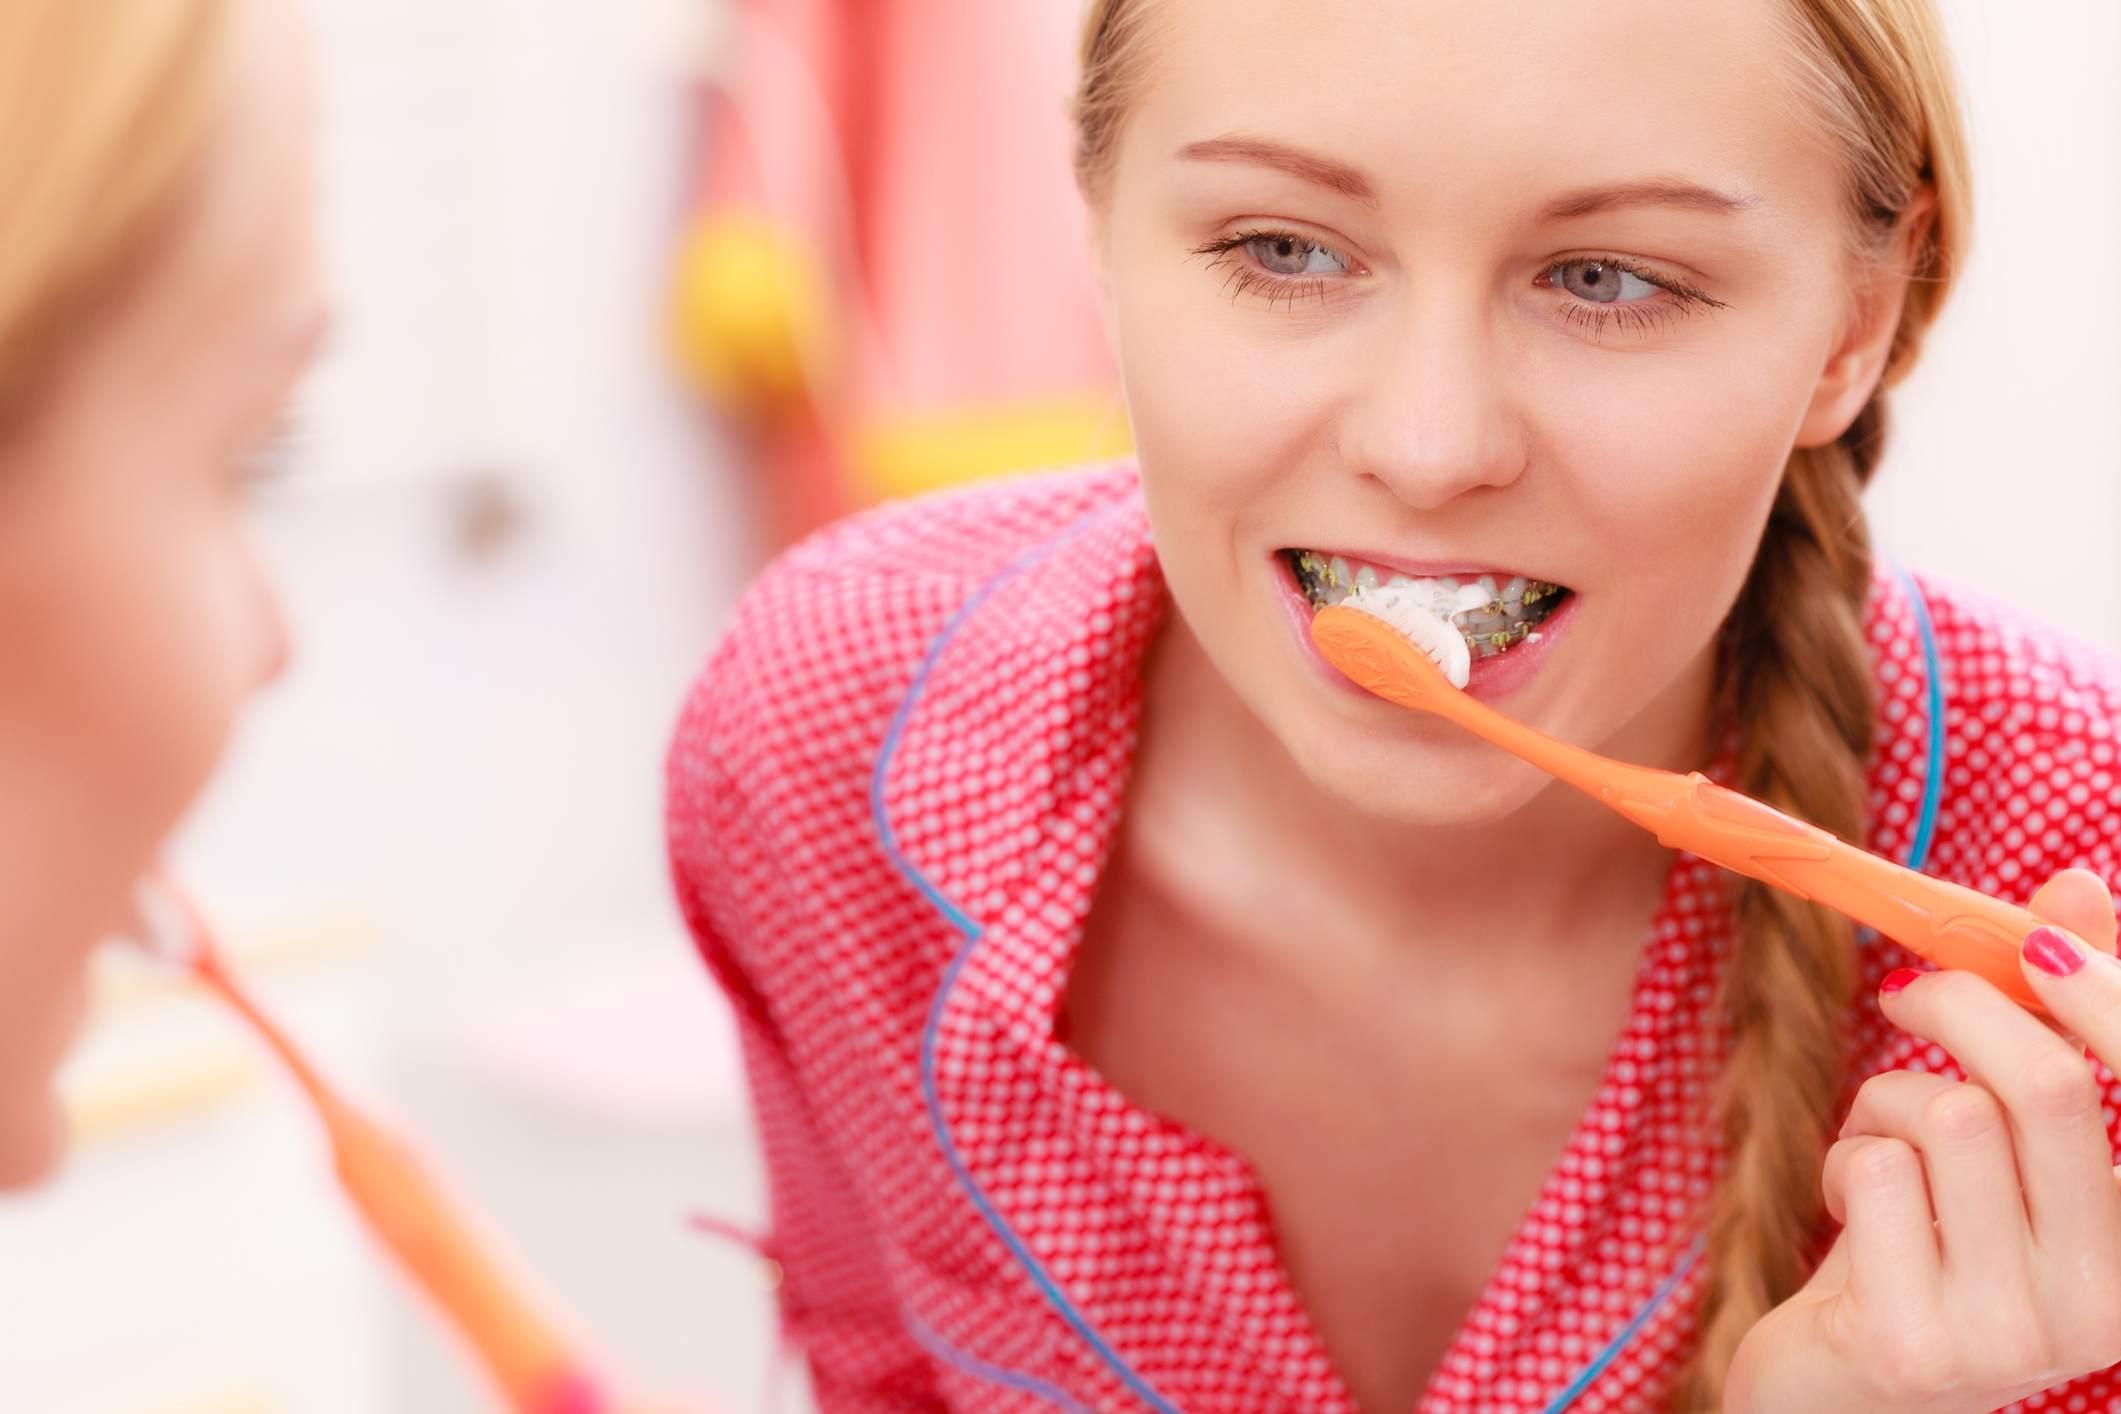 teen girl with braces brushing teeth